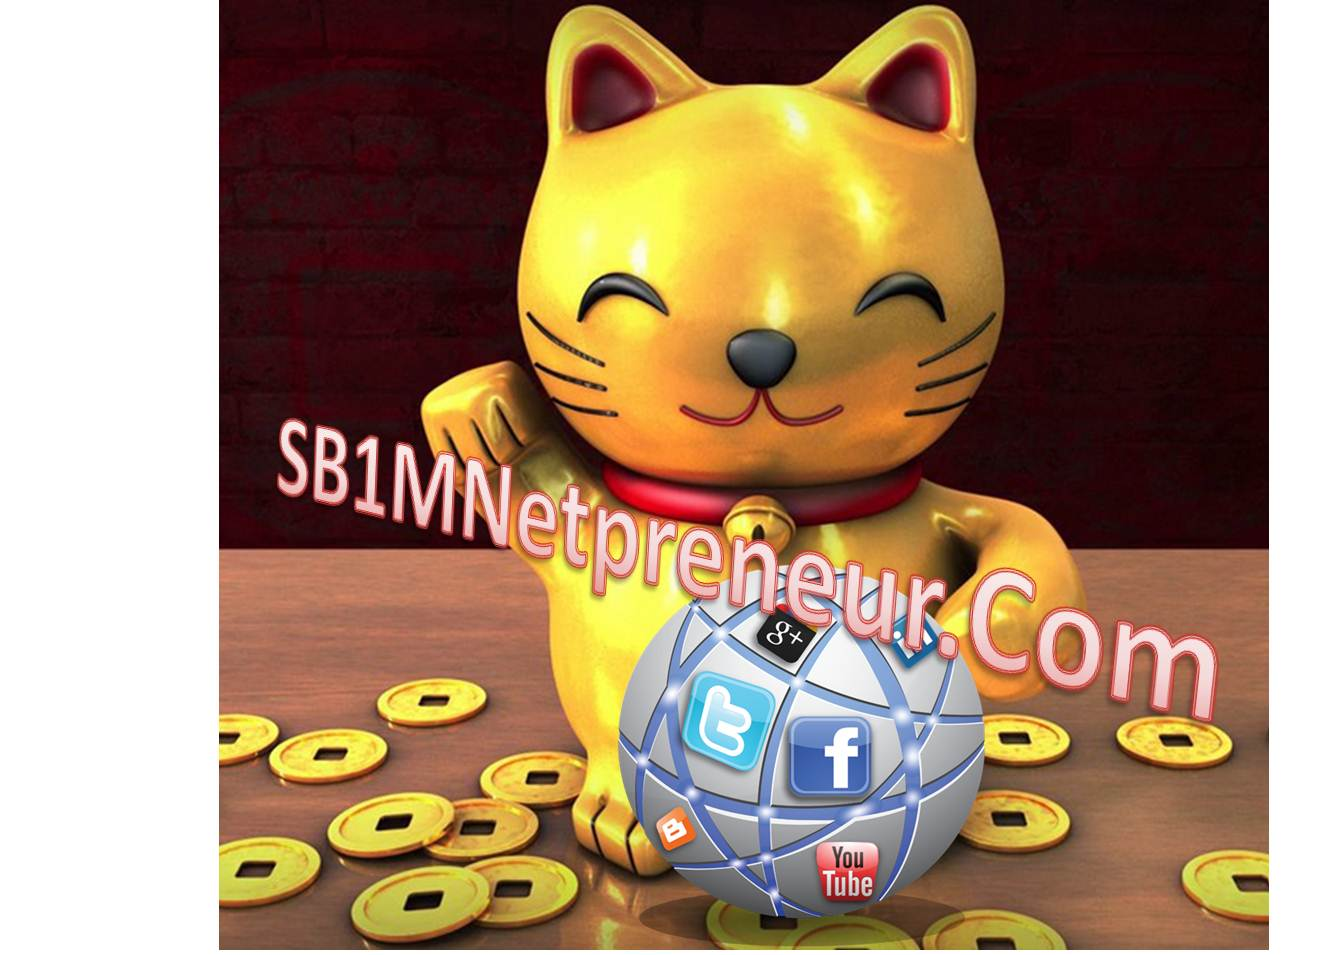 Belajar Internet Marketing Pemula: Keyword is the Key